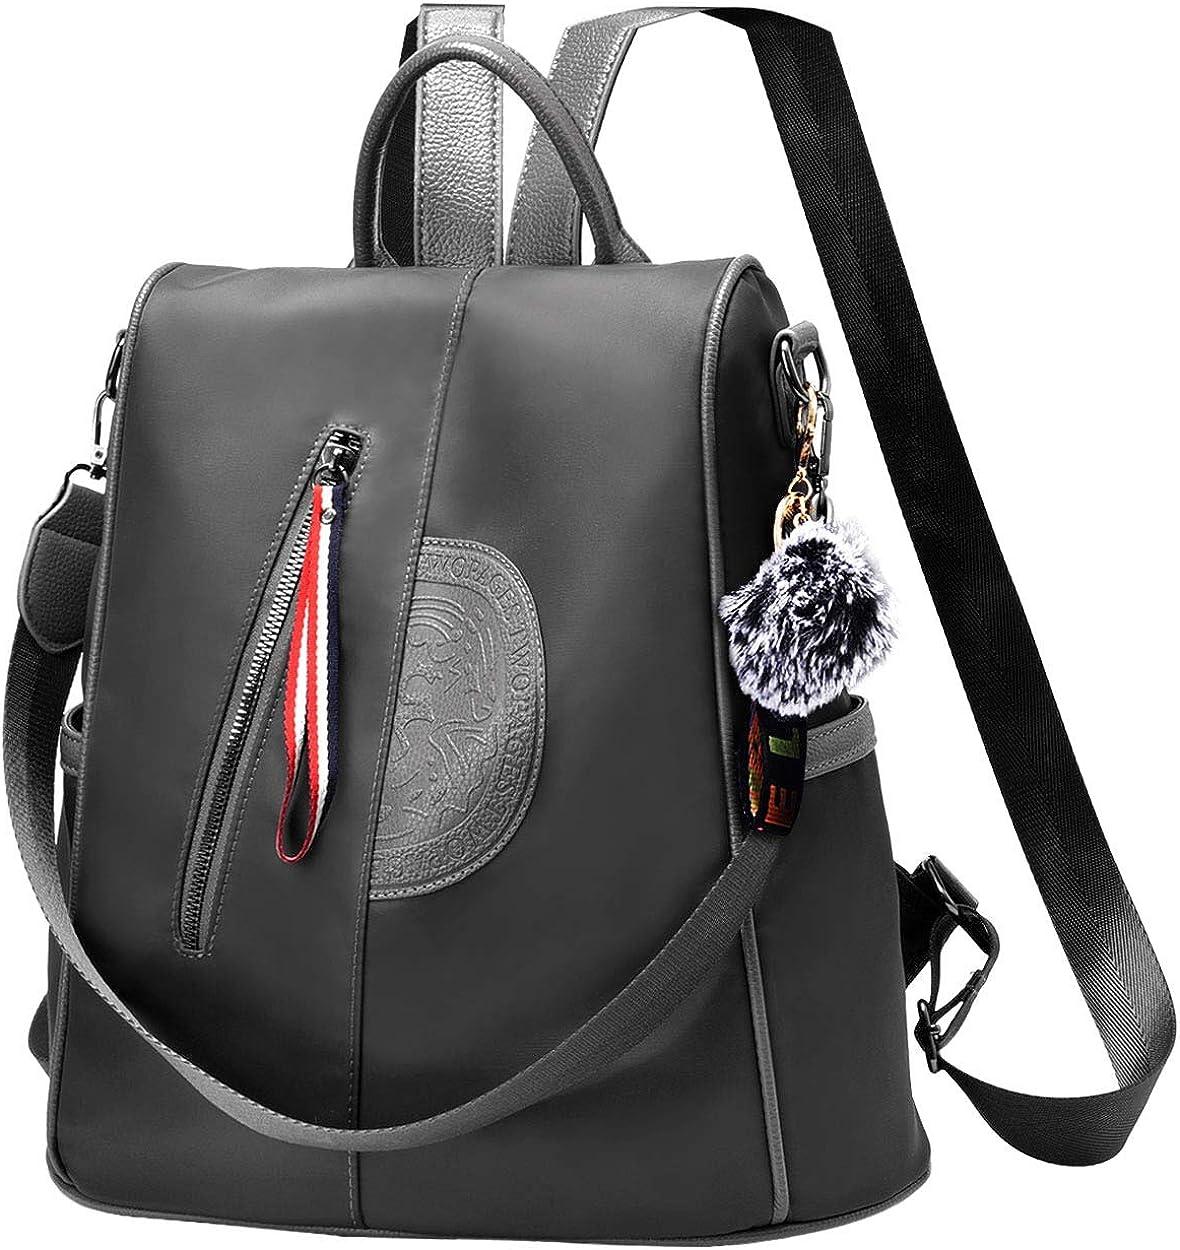 Waterproof Nylon Women Backpack Purse Multipurpose School Travel Shoulder Bag